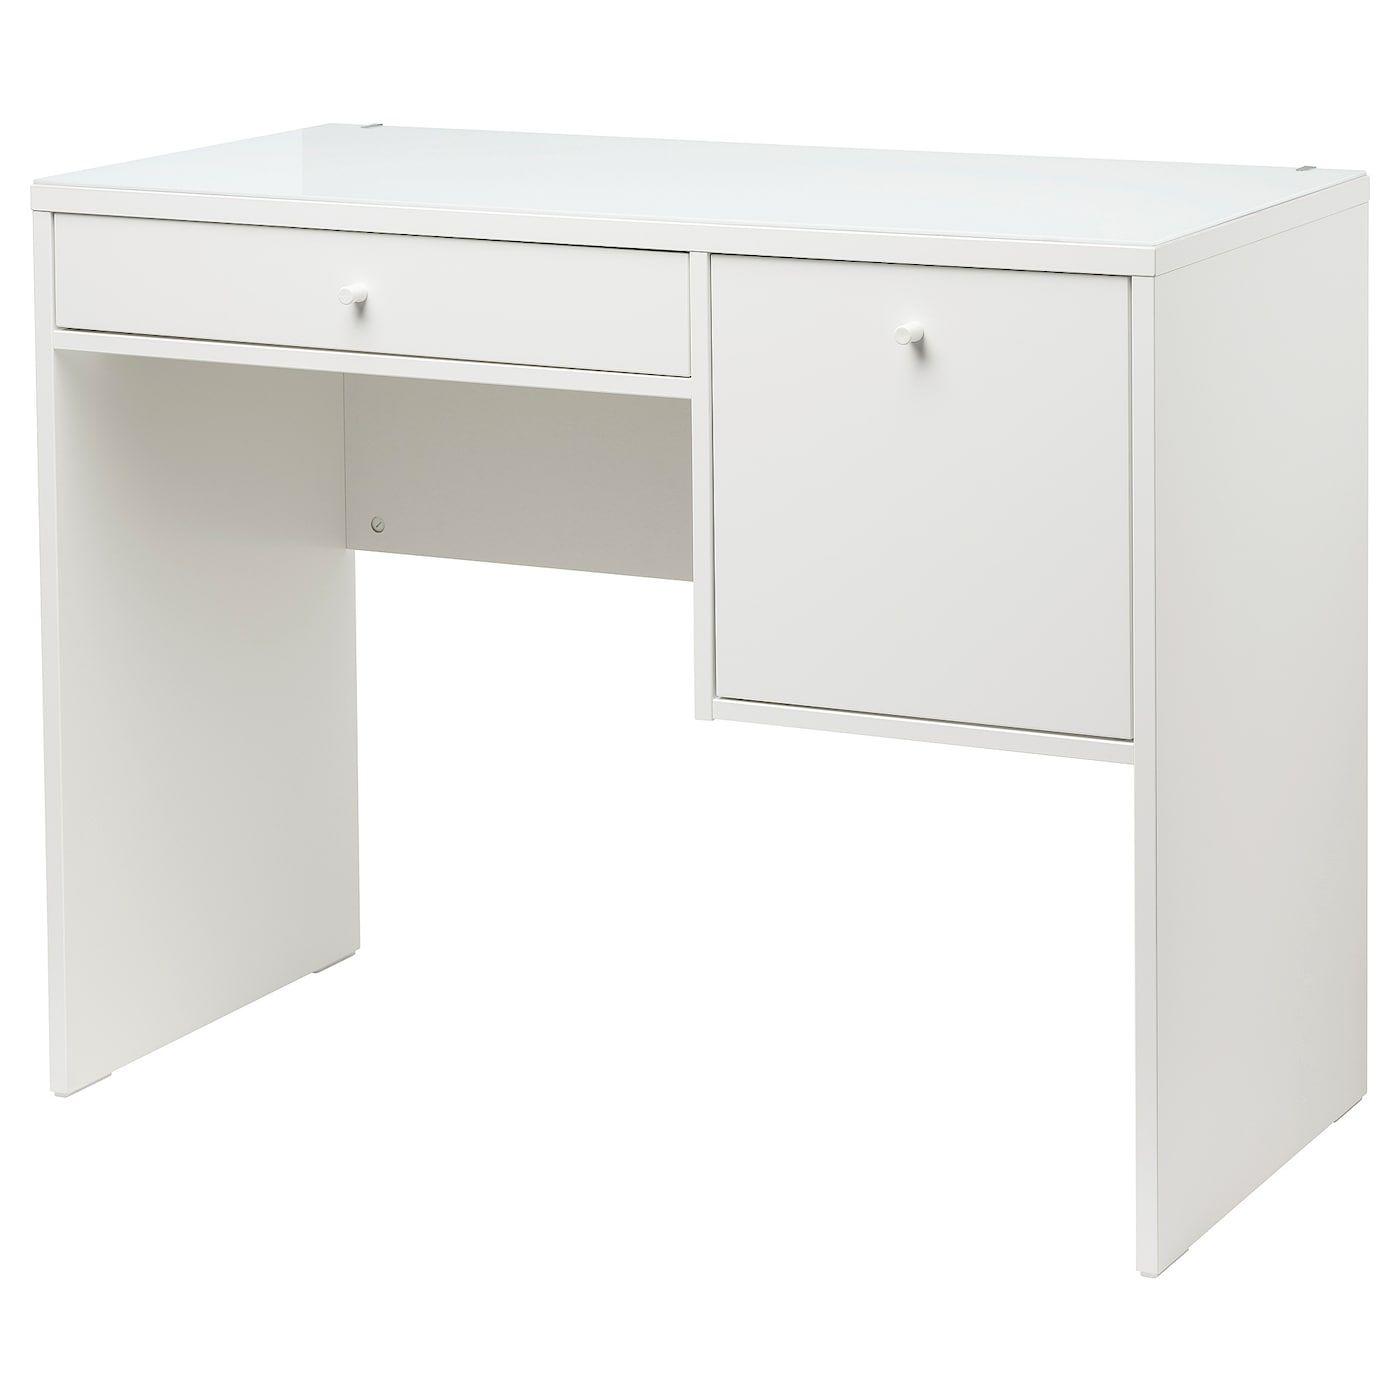 Syvde White Dressing Table Ikea In 2020 Ikea Dressing Table White Dressing Tables Dressing Table